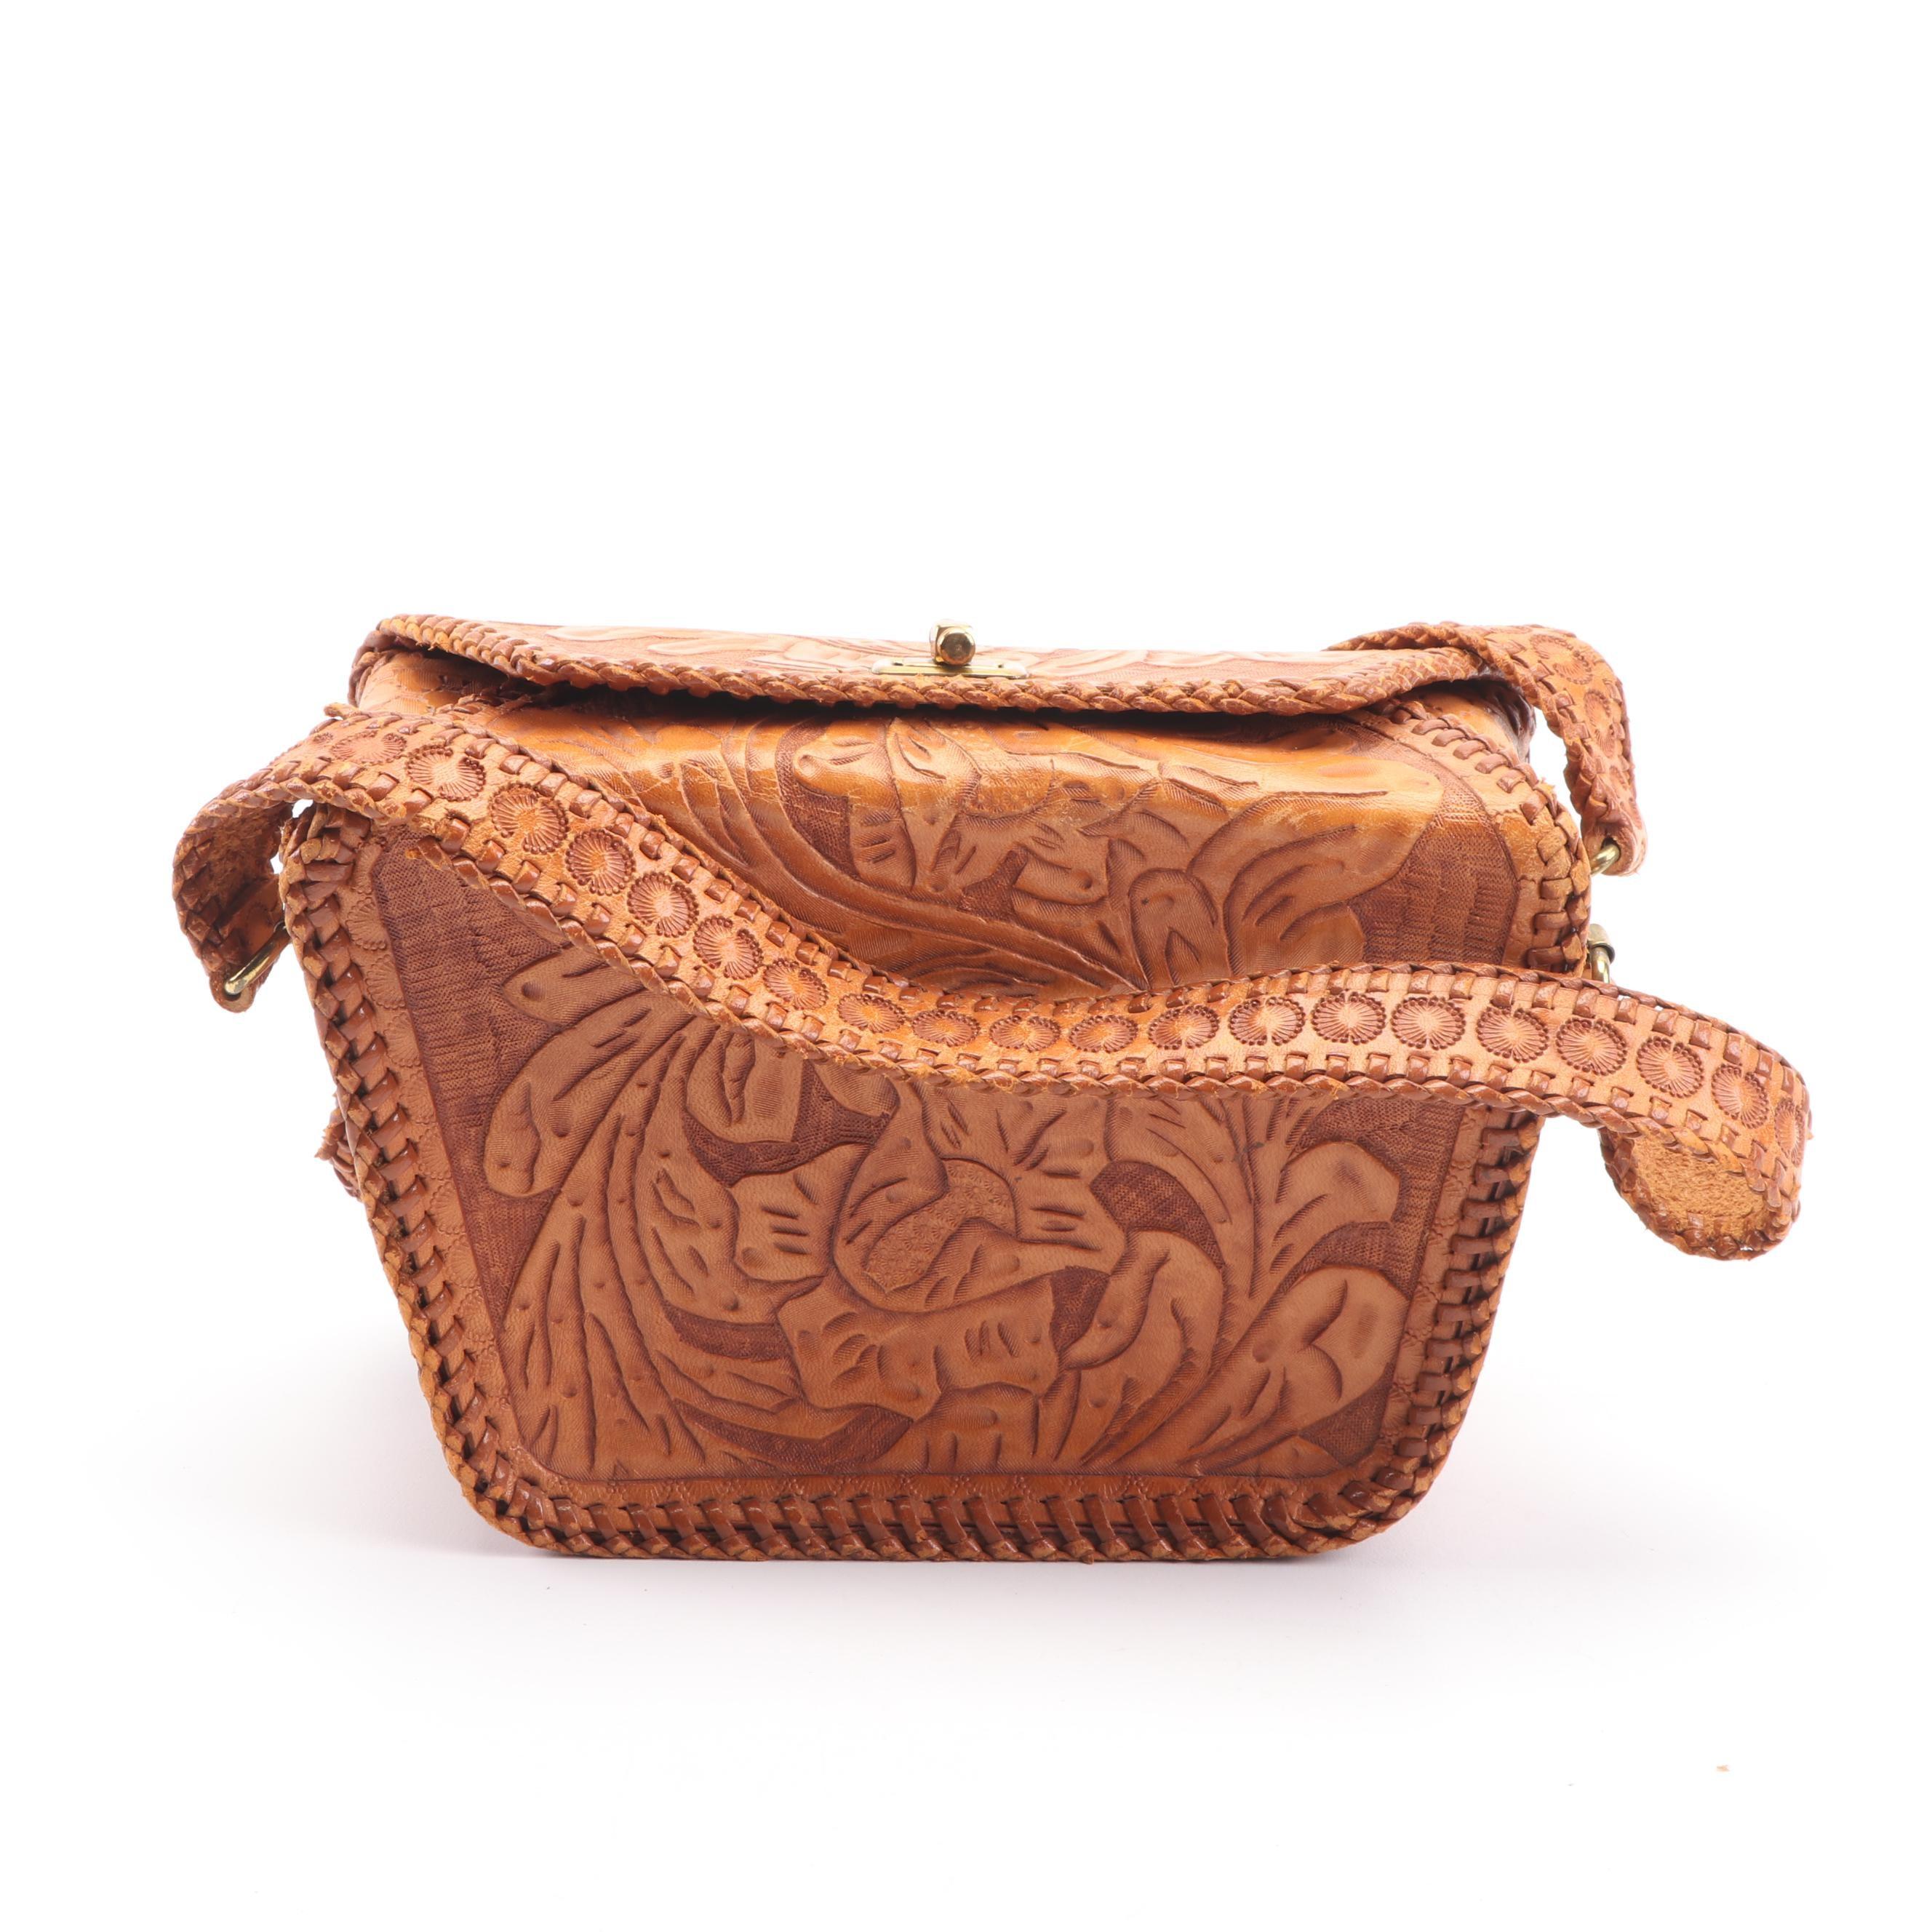 Vintage Brown Tooled Leather Handbag